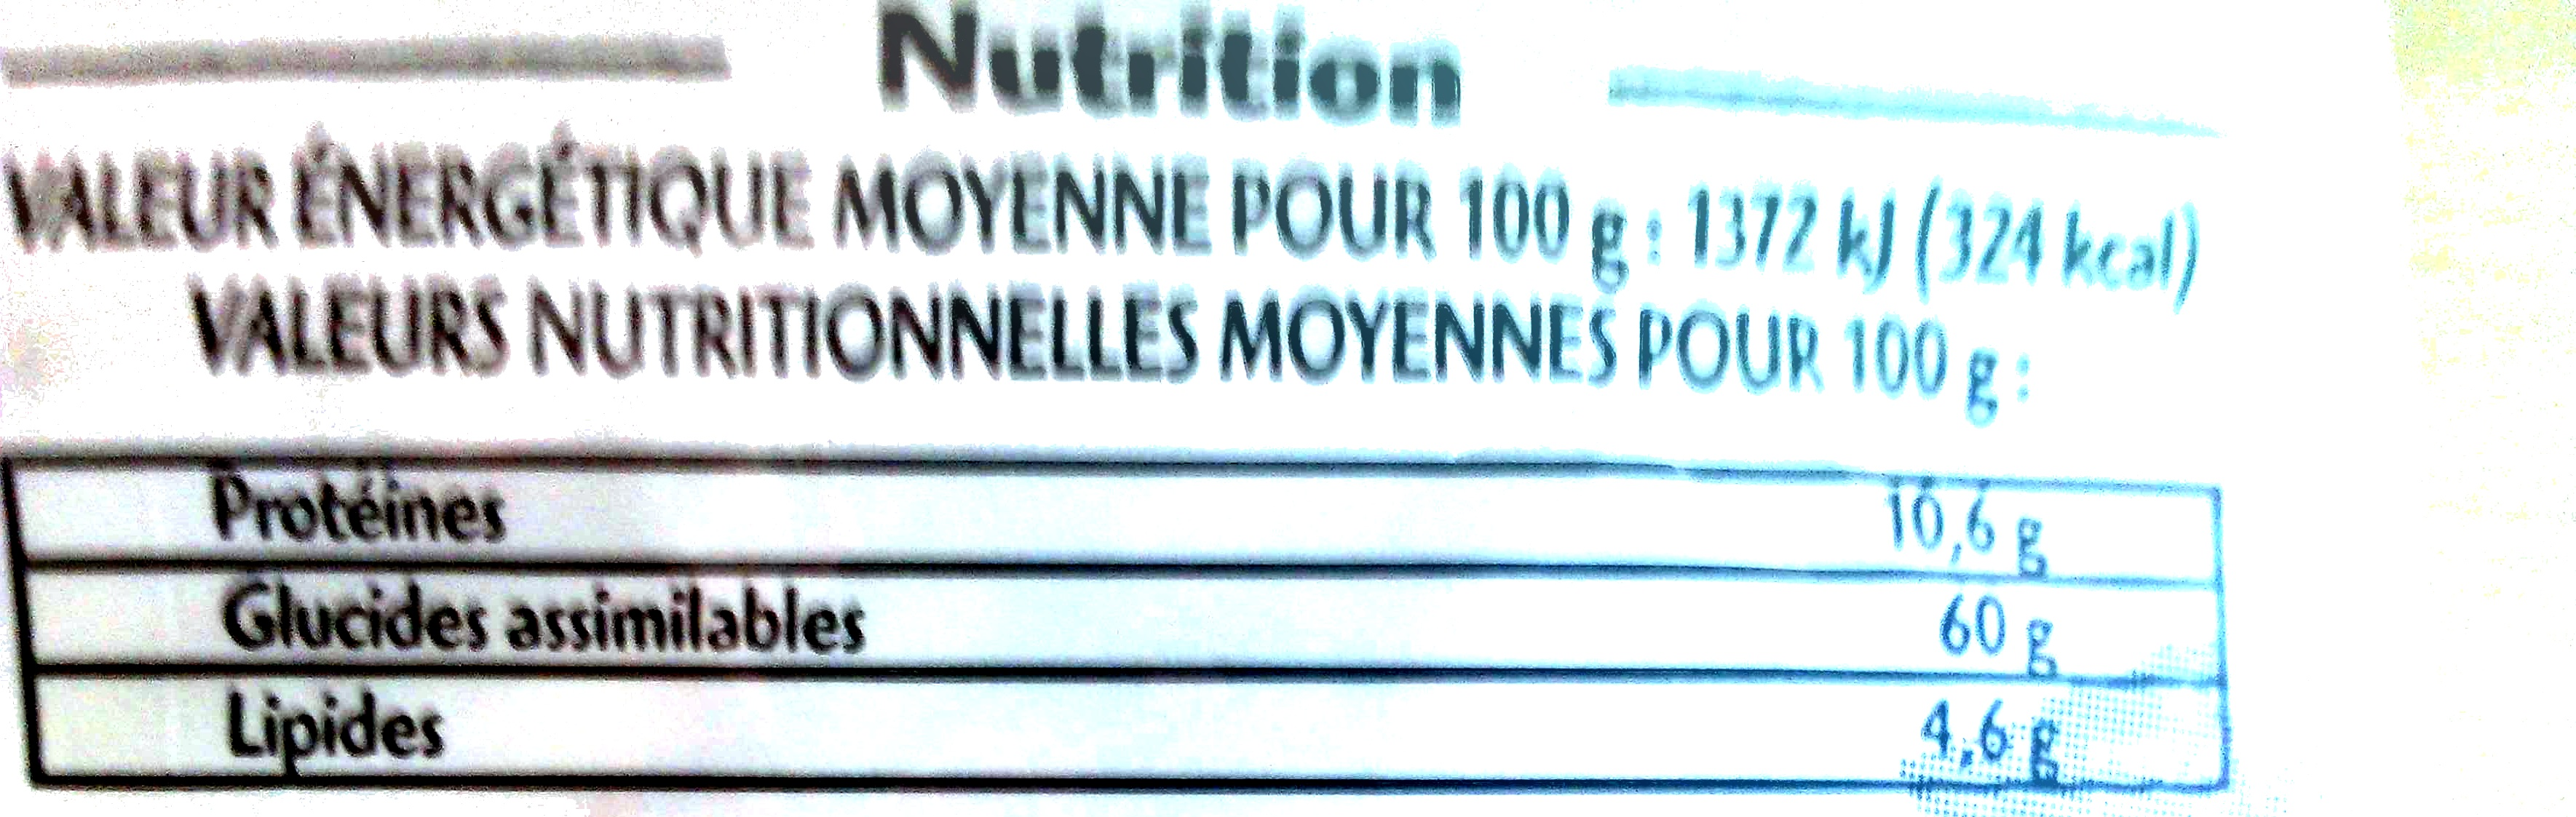 Maïs à Pop-Corn - Voedingswaarden - fr